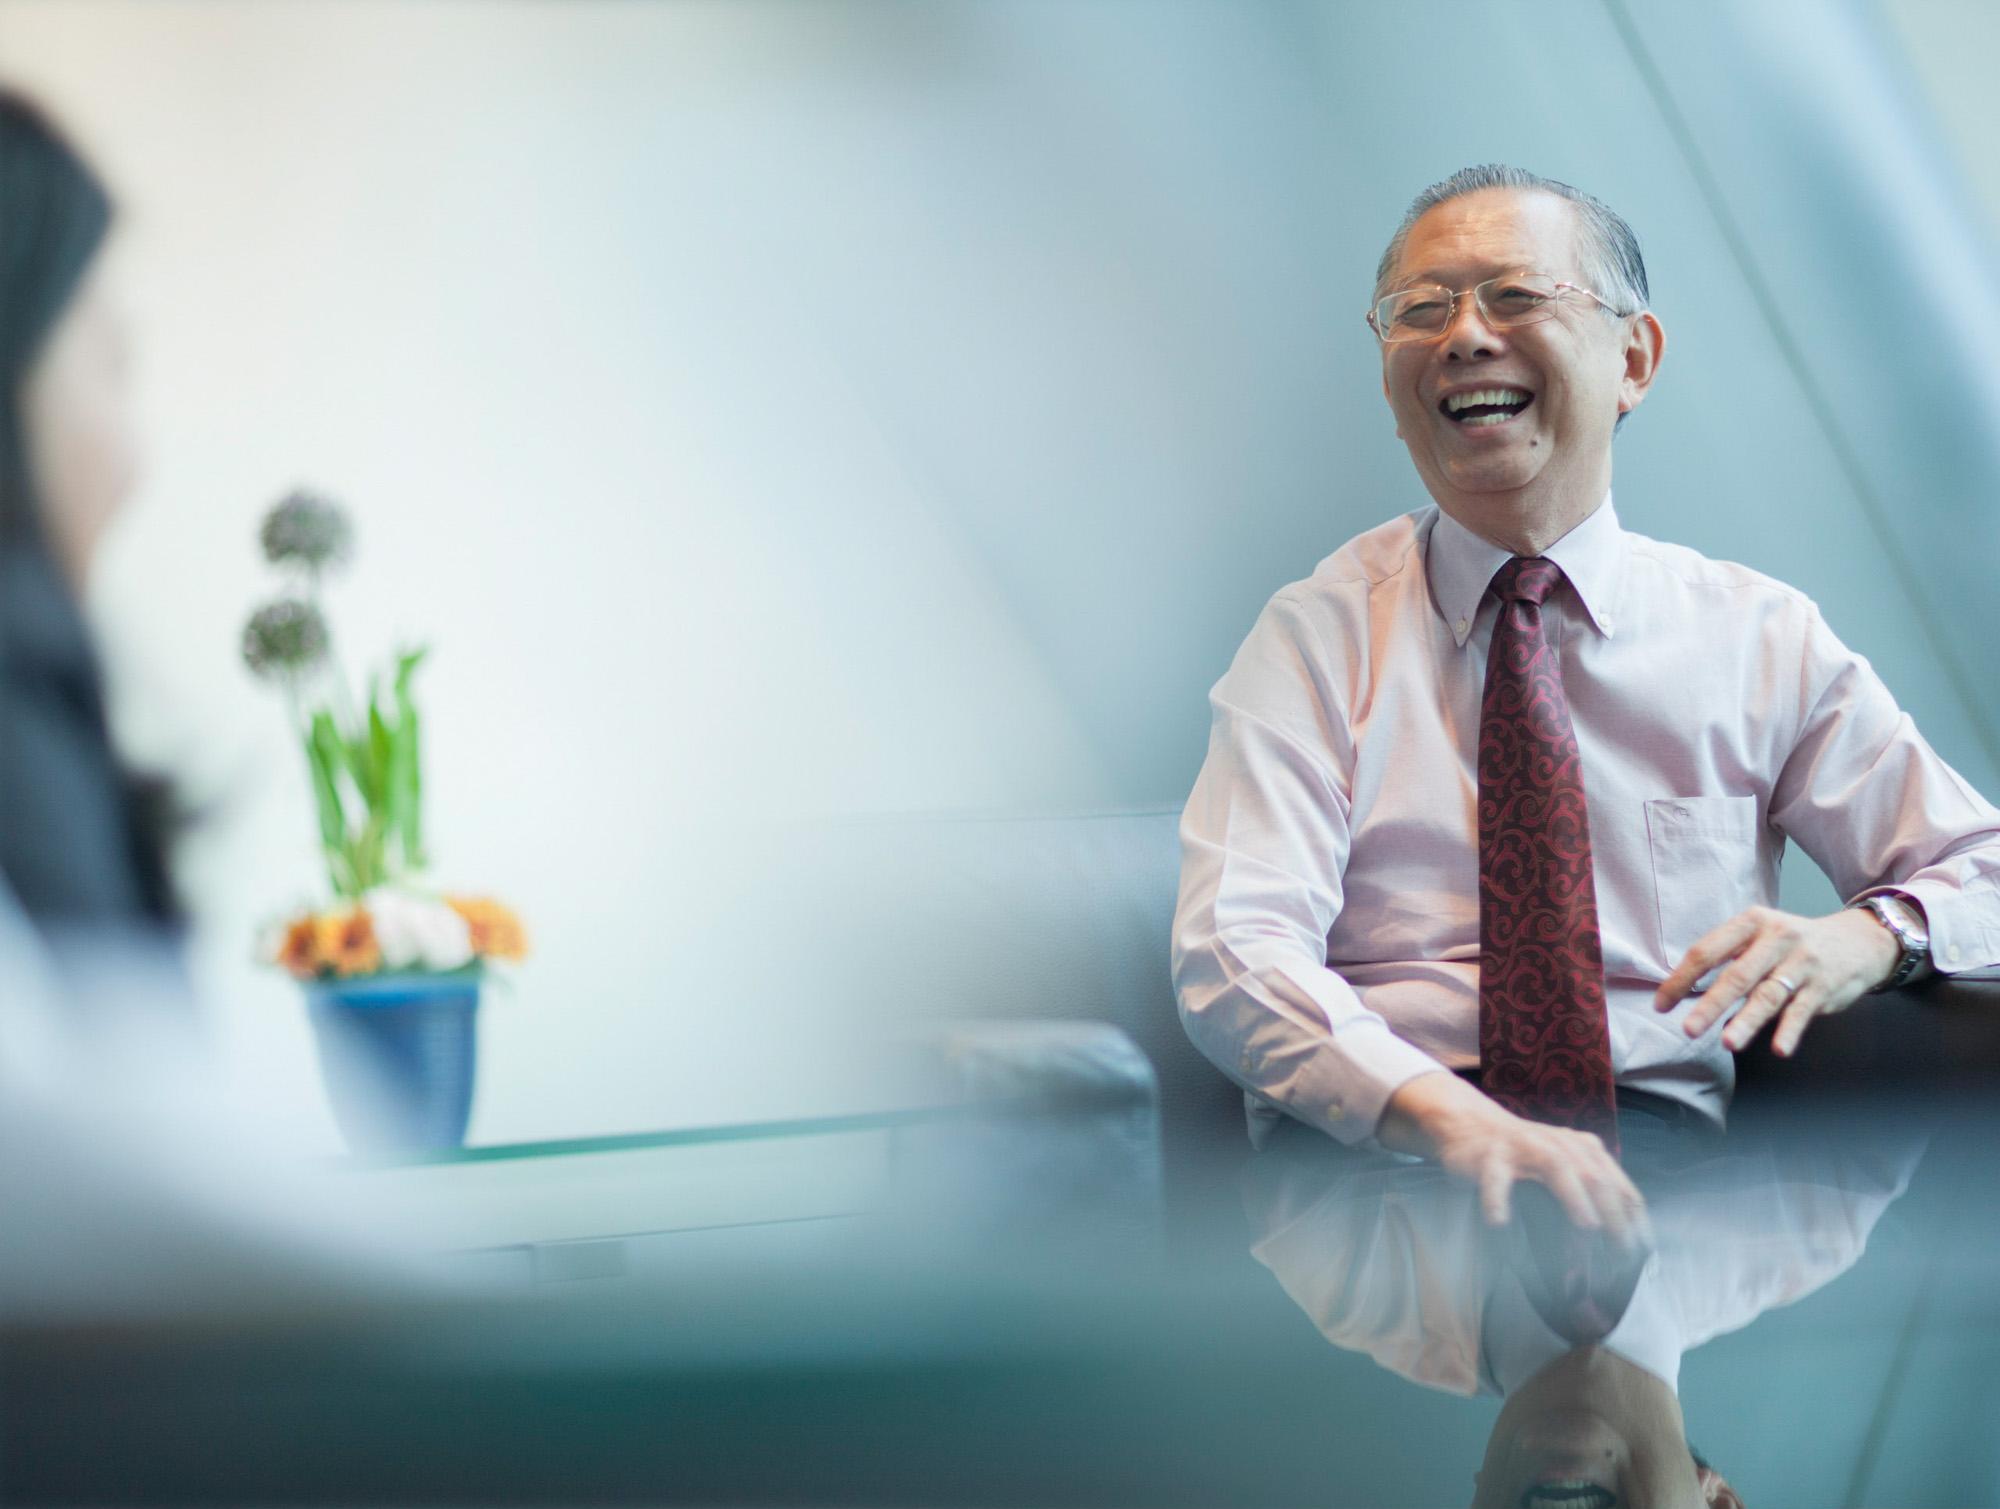 GIC Chairman Lim, Siong Guan